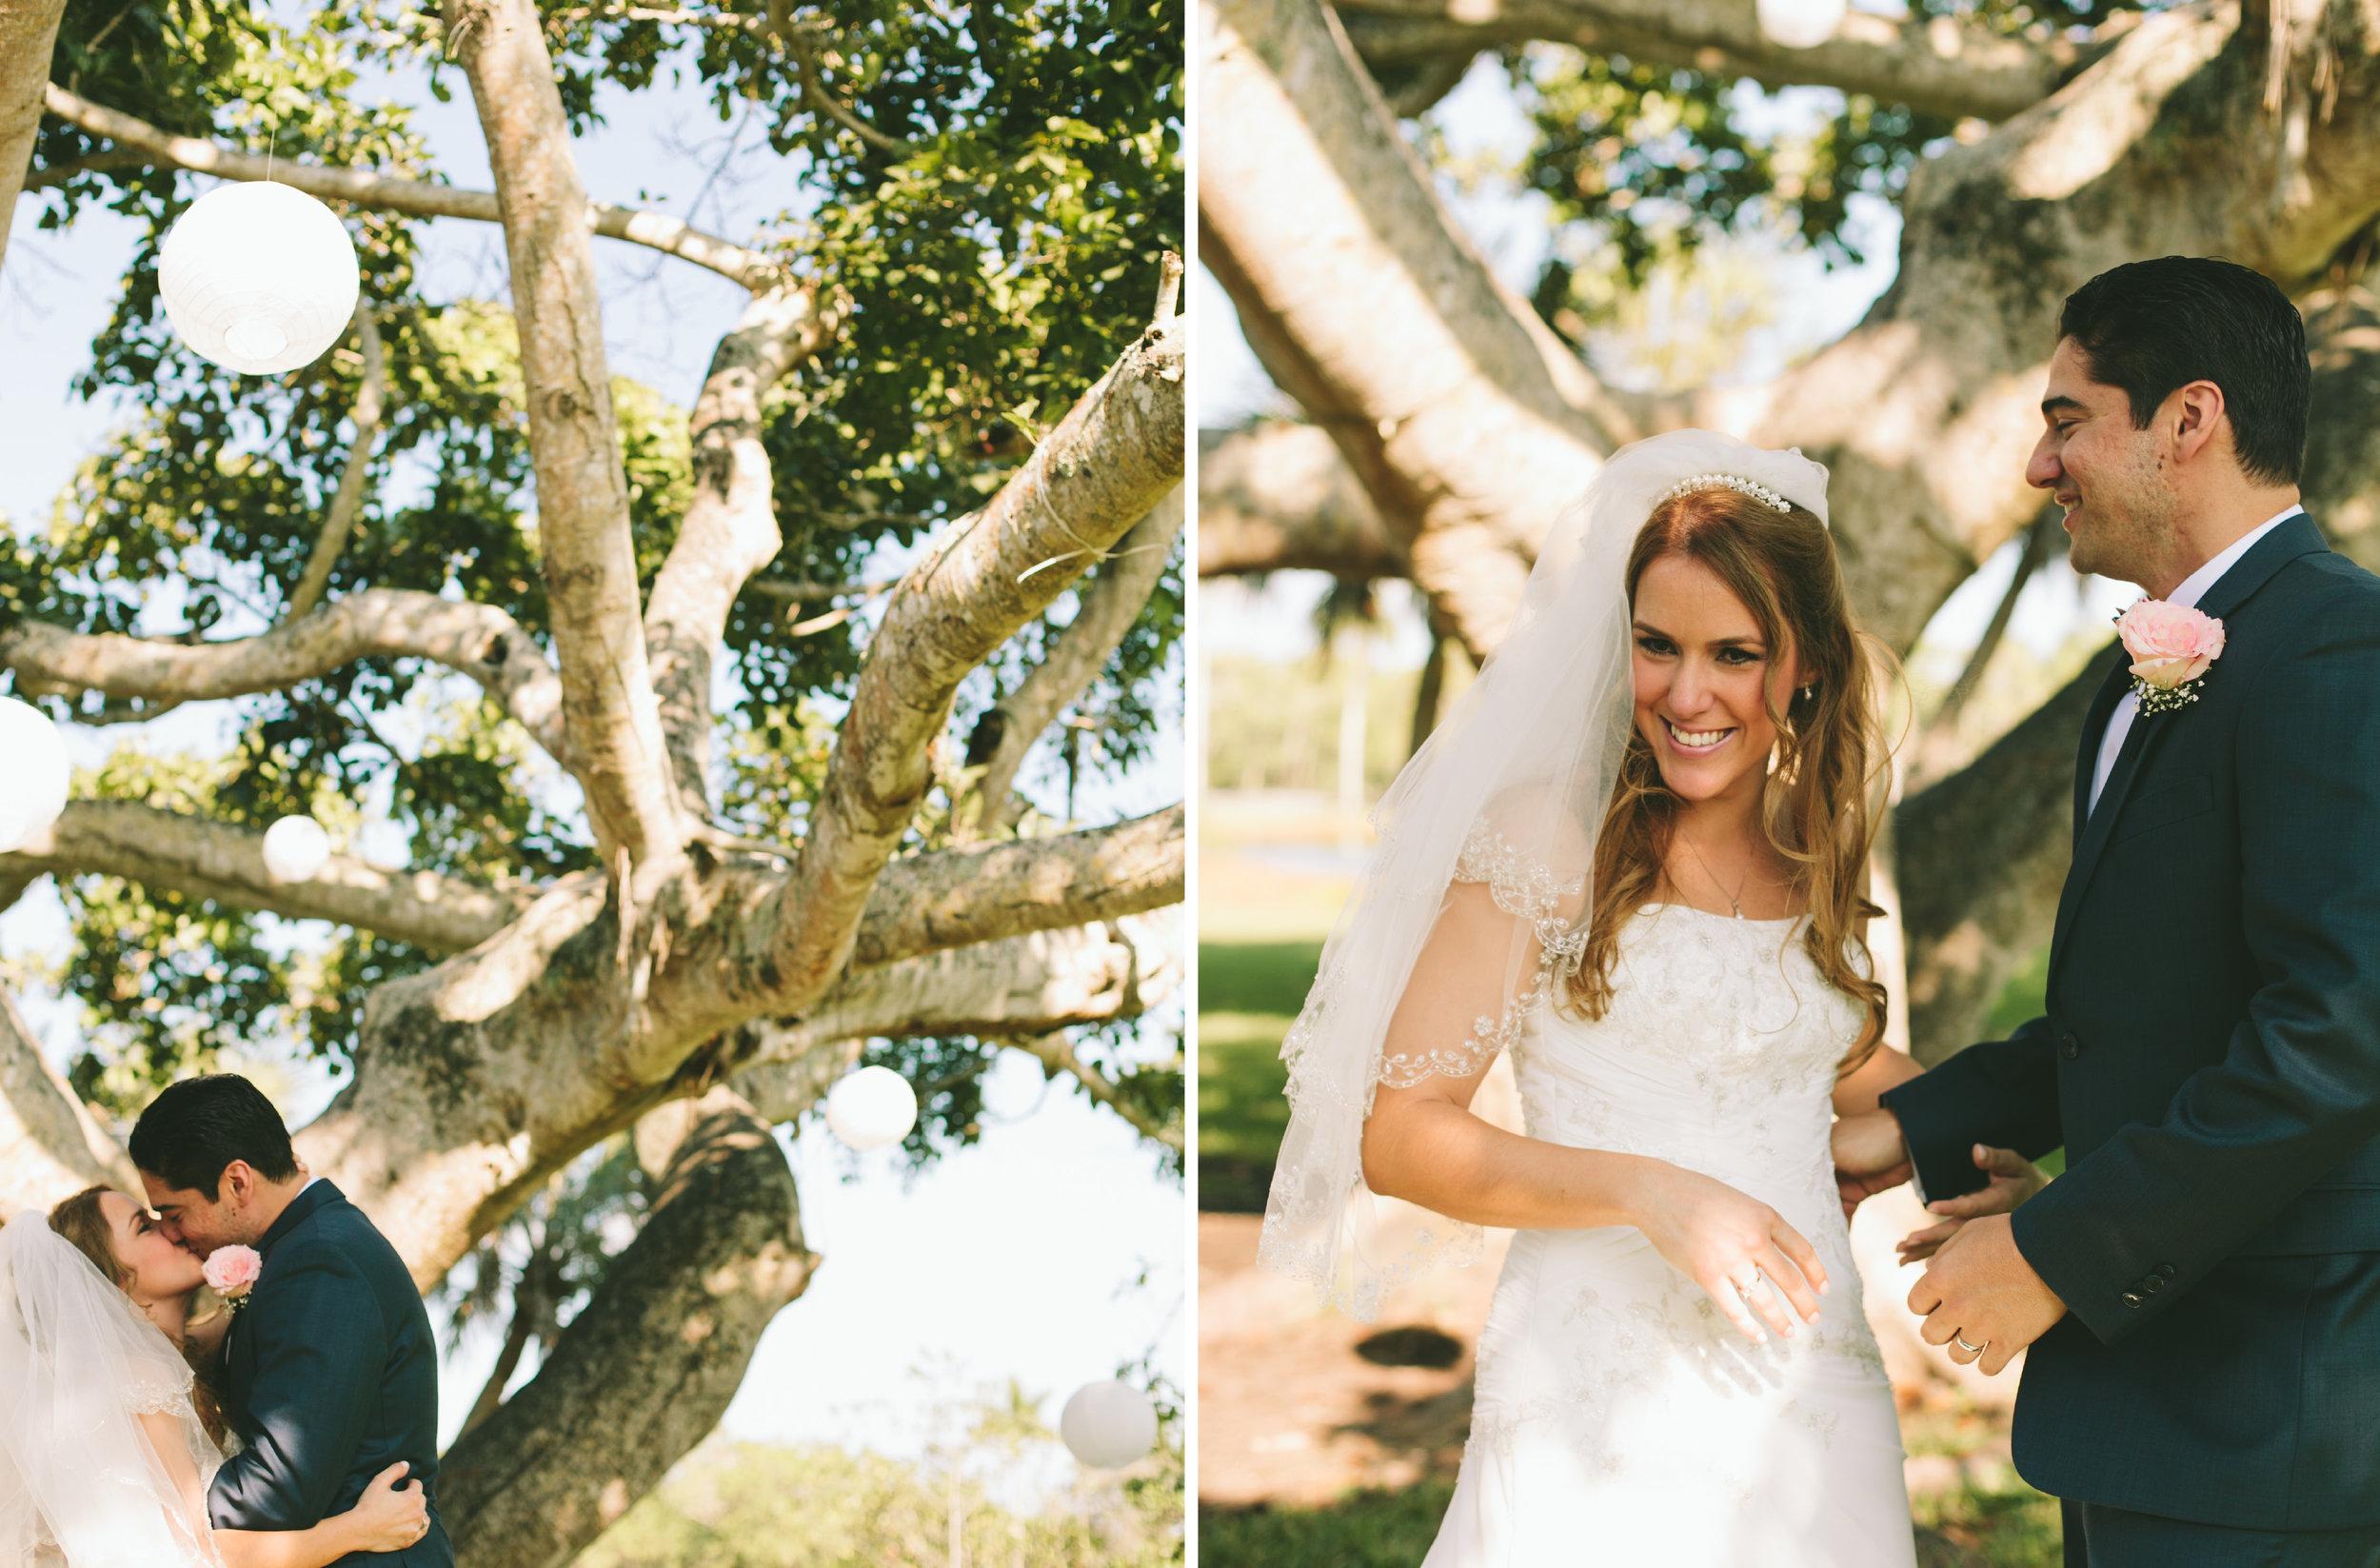 Karen + Lester Matheson Hammock Park Wedding20.jpg